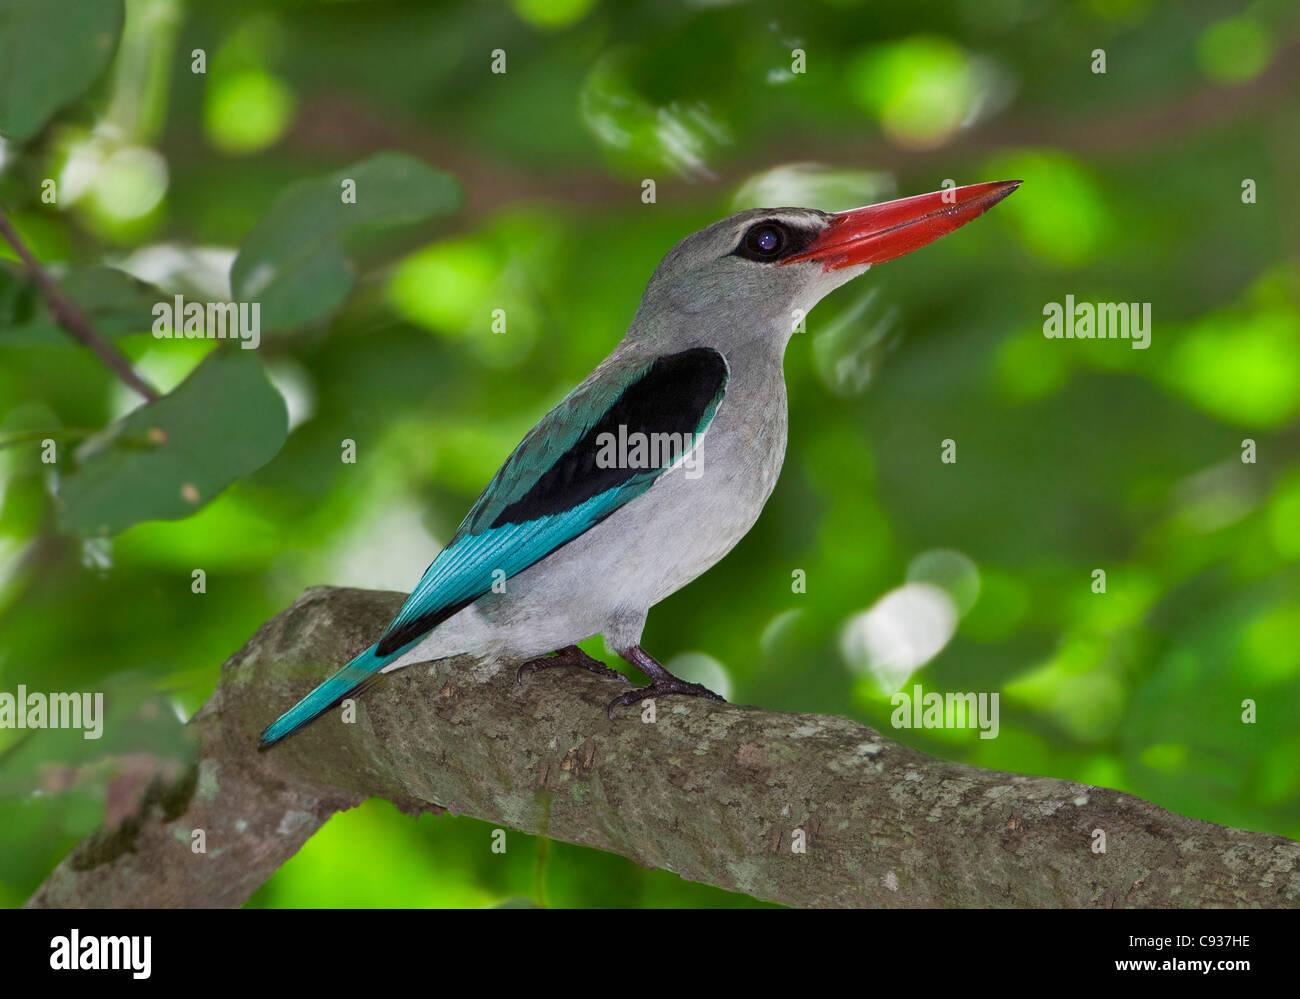 A Mangrove Kingfisher at Mida Creek, Watamu. - Stock Image